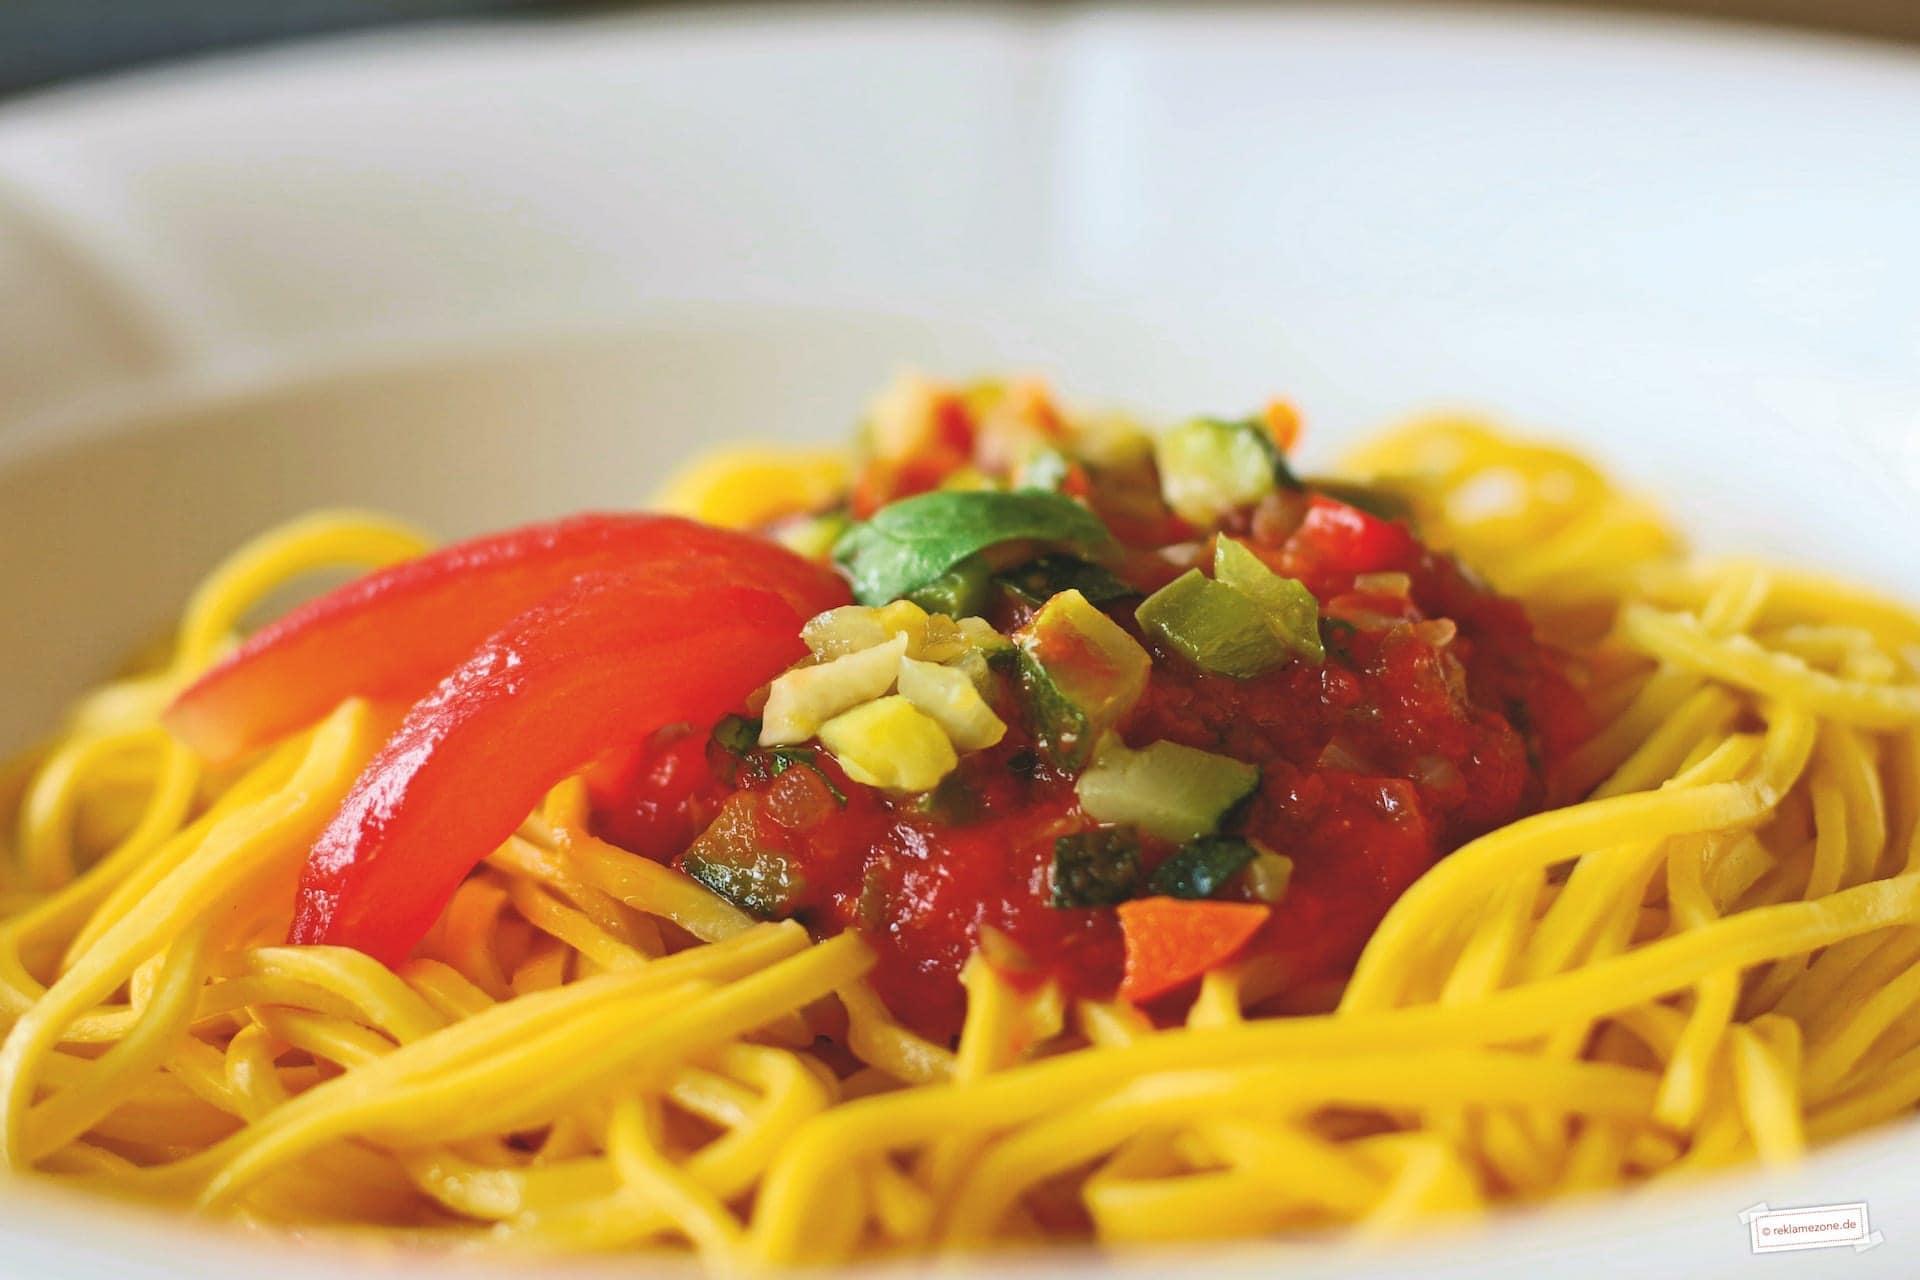 Nudeln mit selbstgemachter Tomatensoße - Foto: reklamezone.de